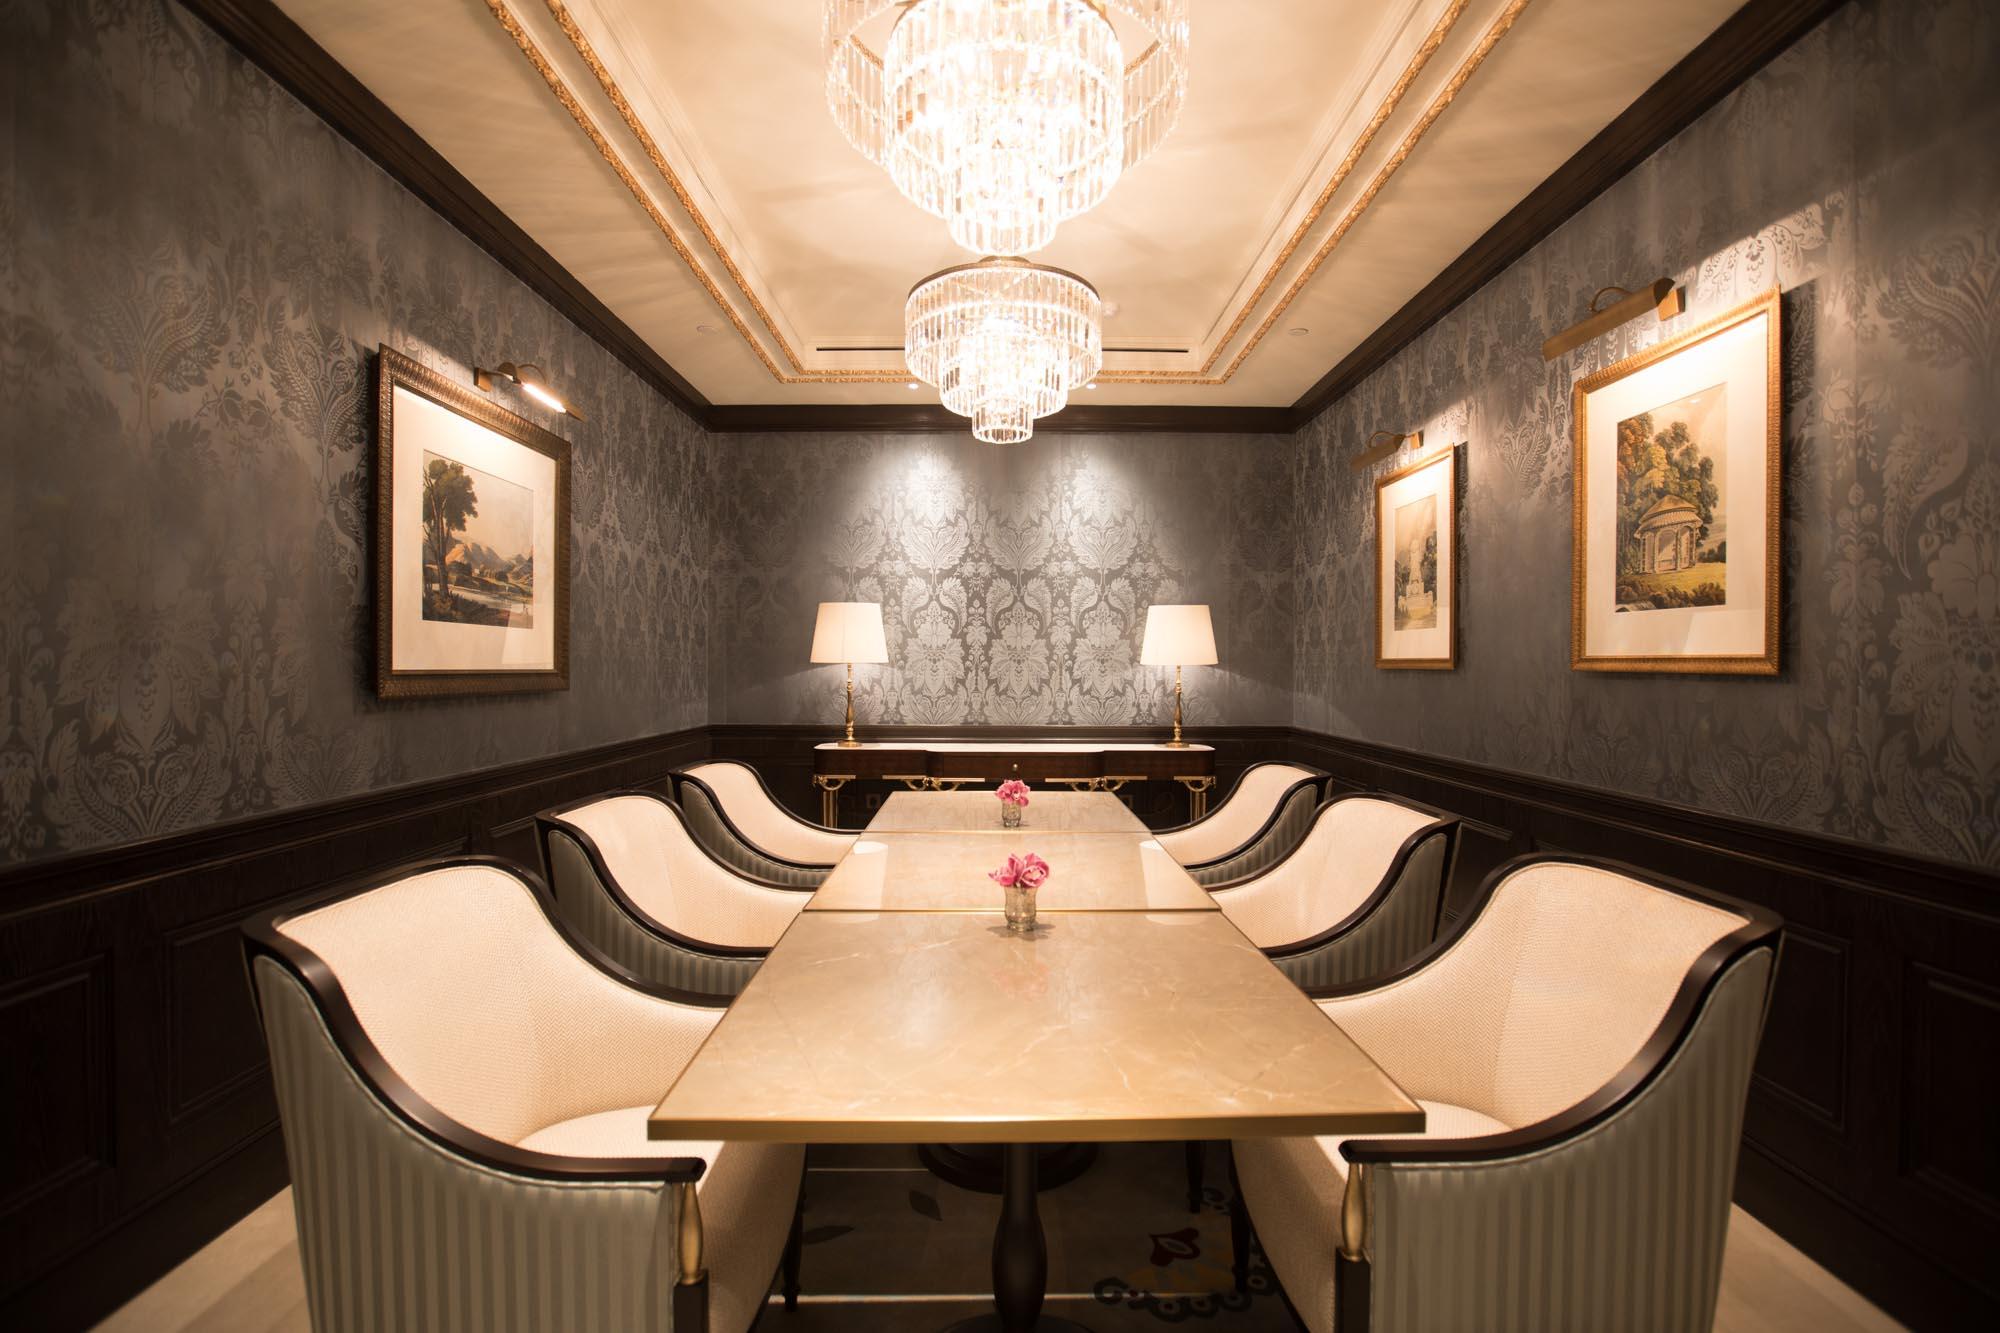 Lanesborough-club-spa-decca-london-private-dining